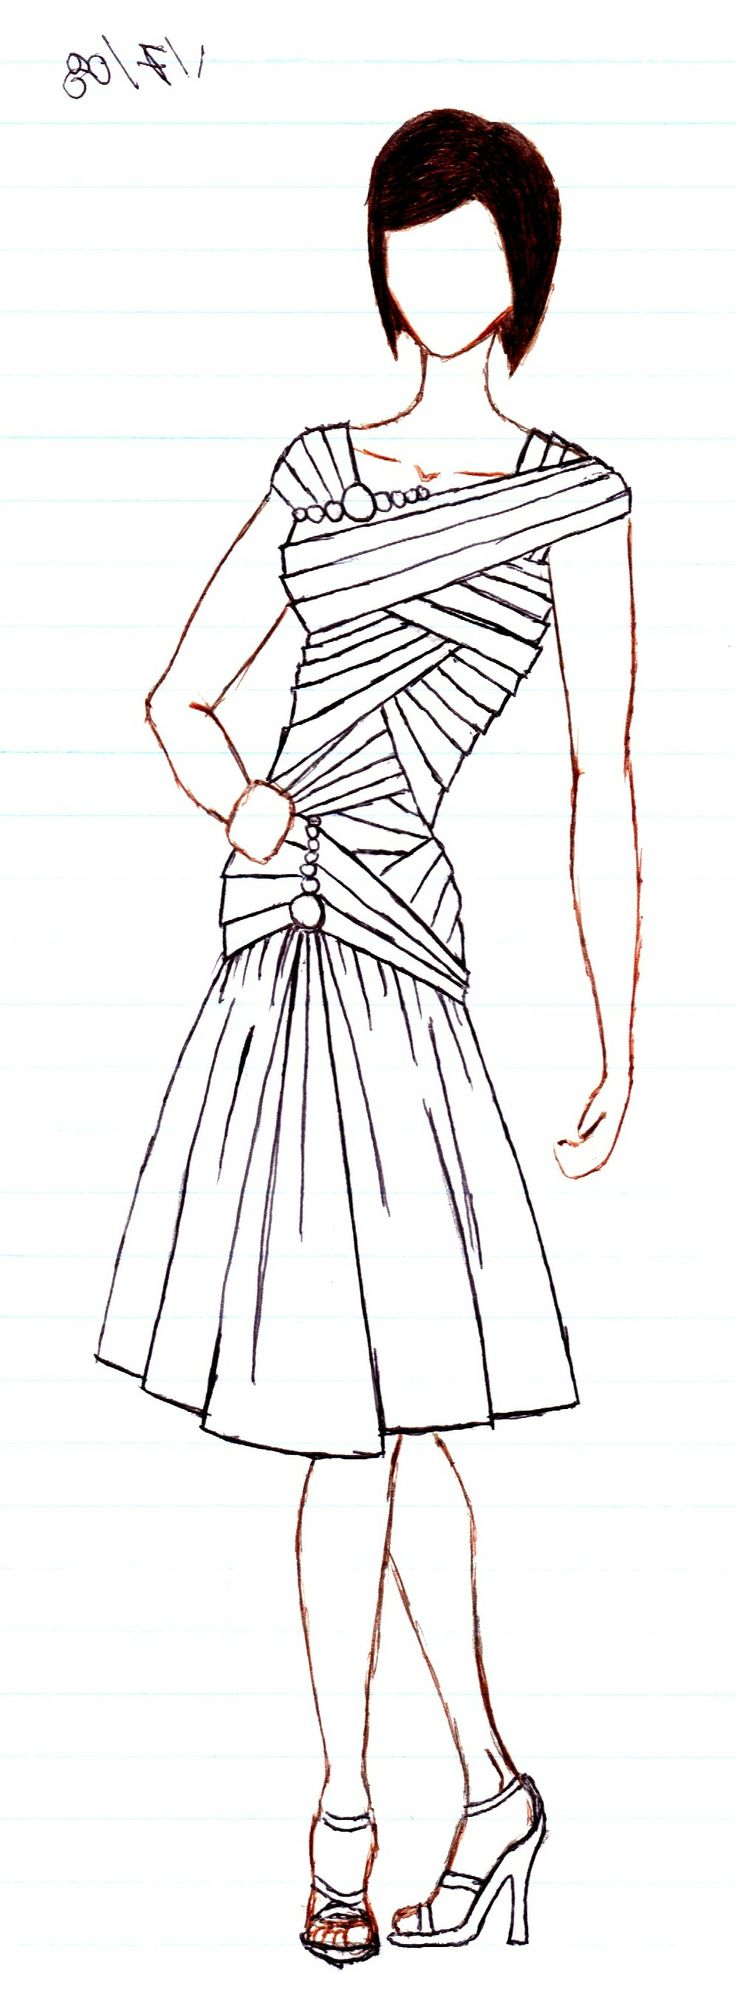 dress designs drawings 2012 wwwpixsharkcom images